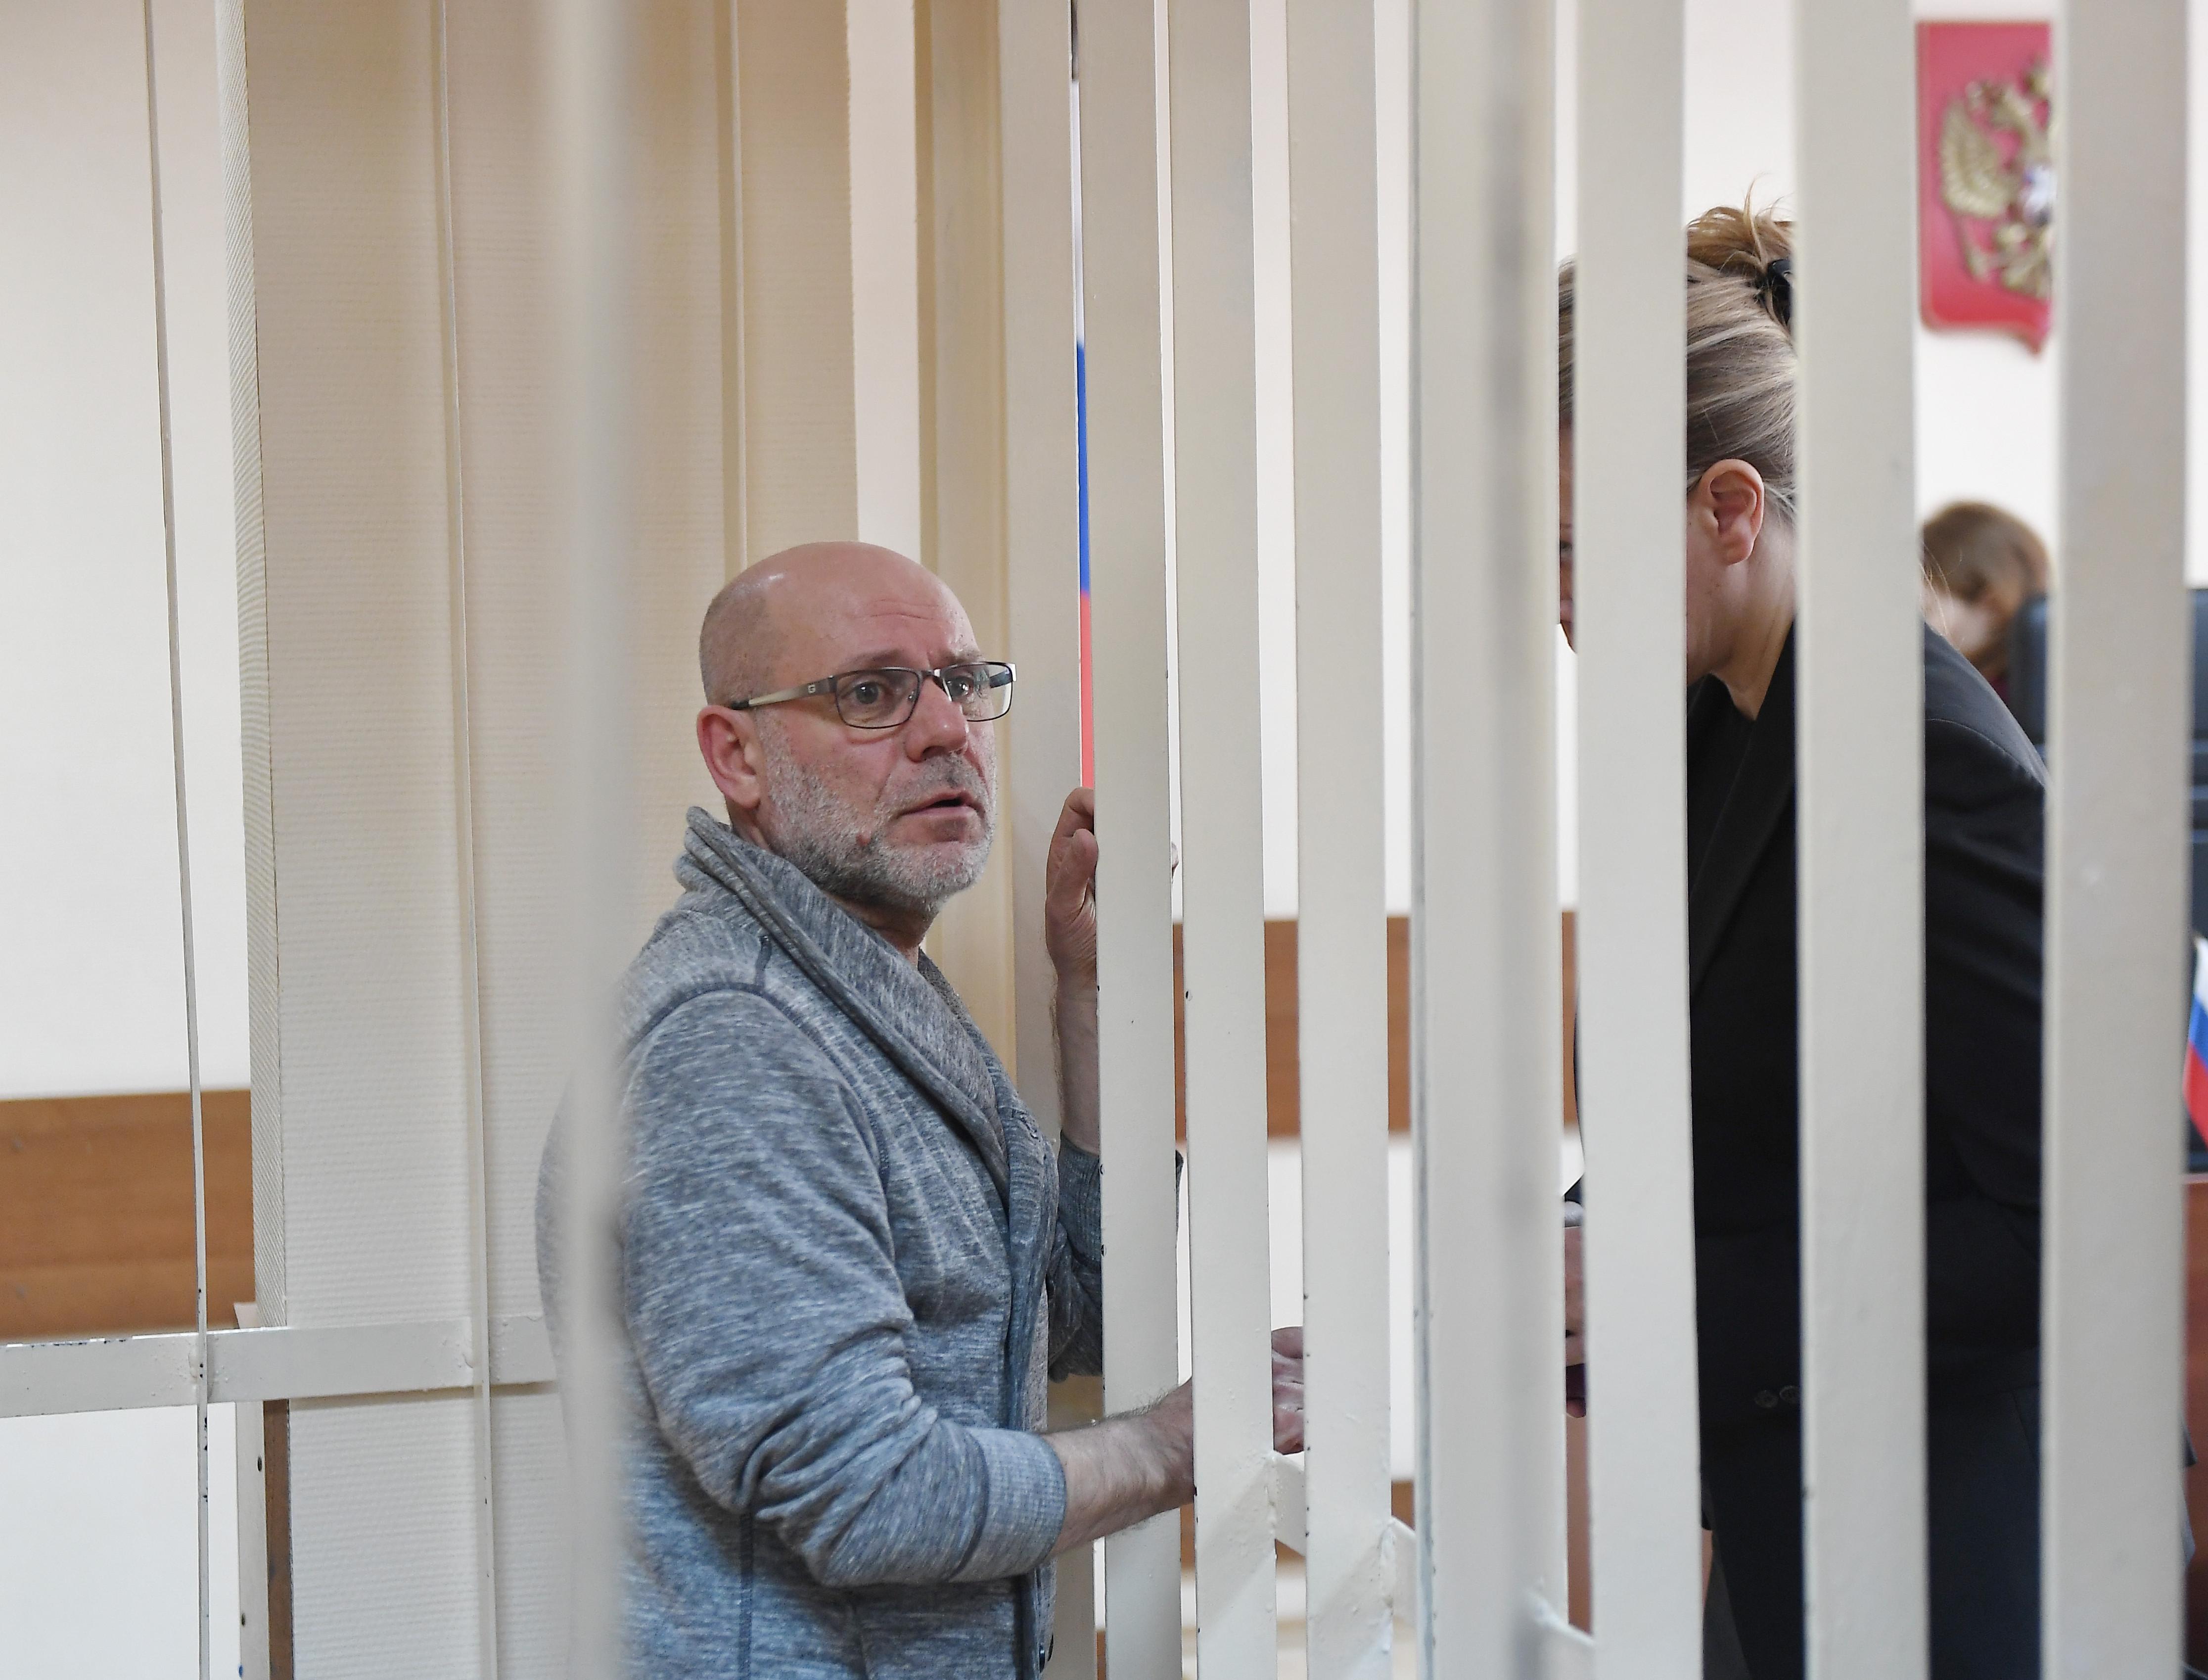 <p>Алексей Малобродский в зале суда. Фото: &copy;РИА Новости/Евгения Новоженина</p>